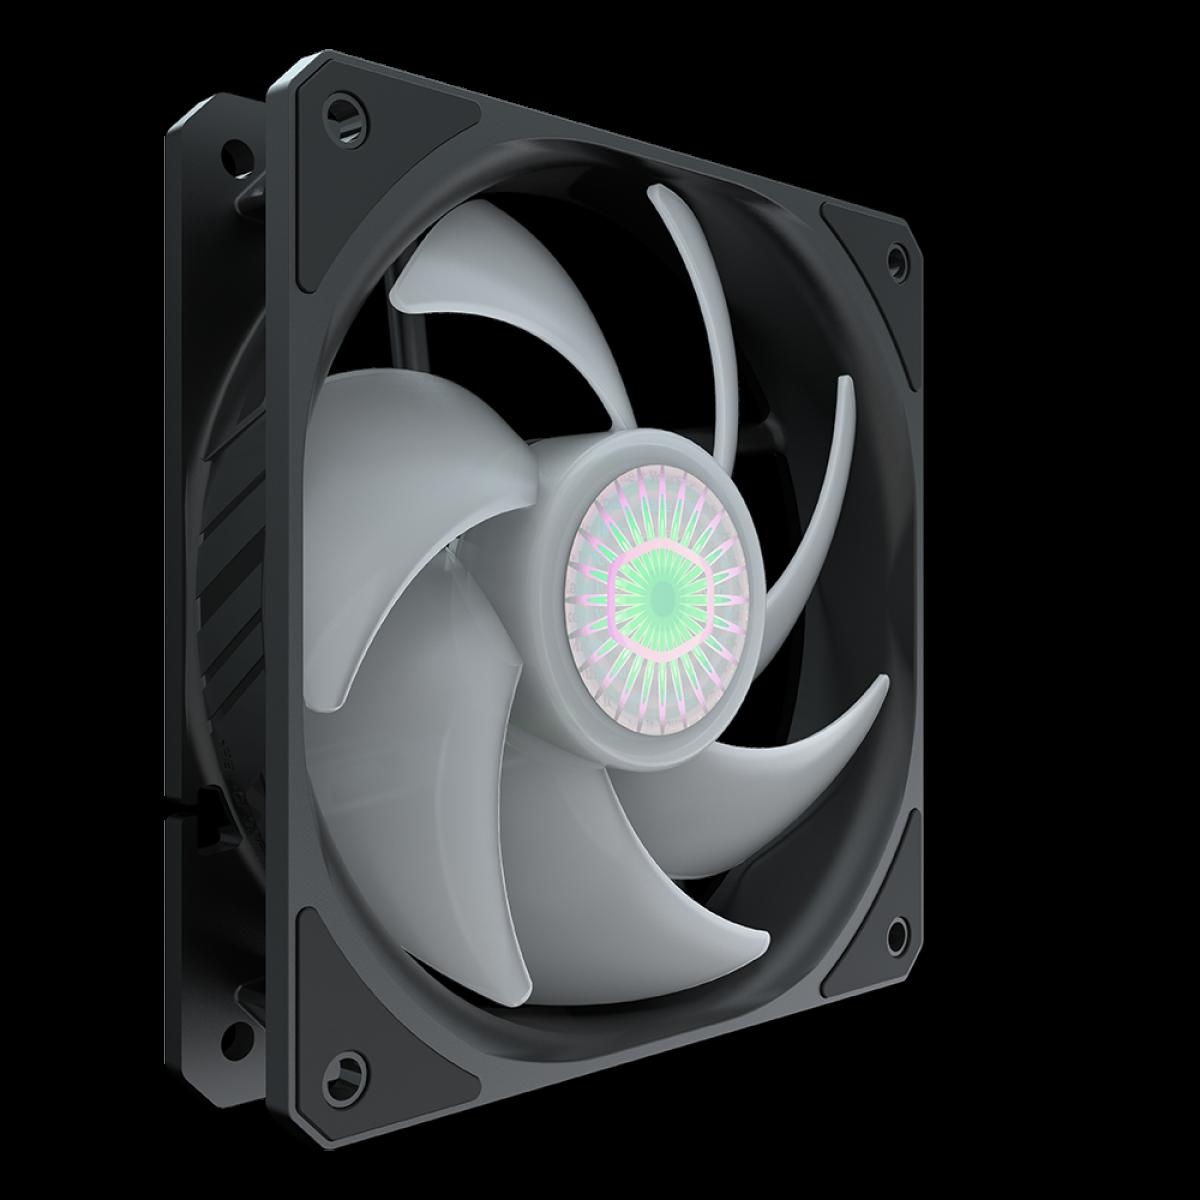 Cooler para Gabinete, Cooler Master, SickleFlow MasterFan MF120 Halo, ARGB, 120mm, 1800RPM, MFX-B2DN-18NPA-R1